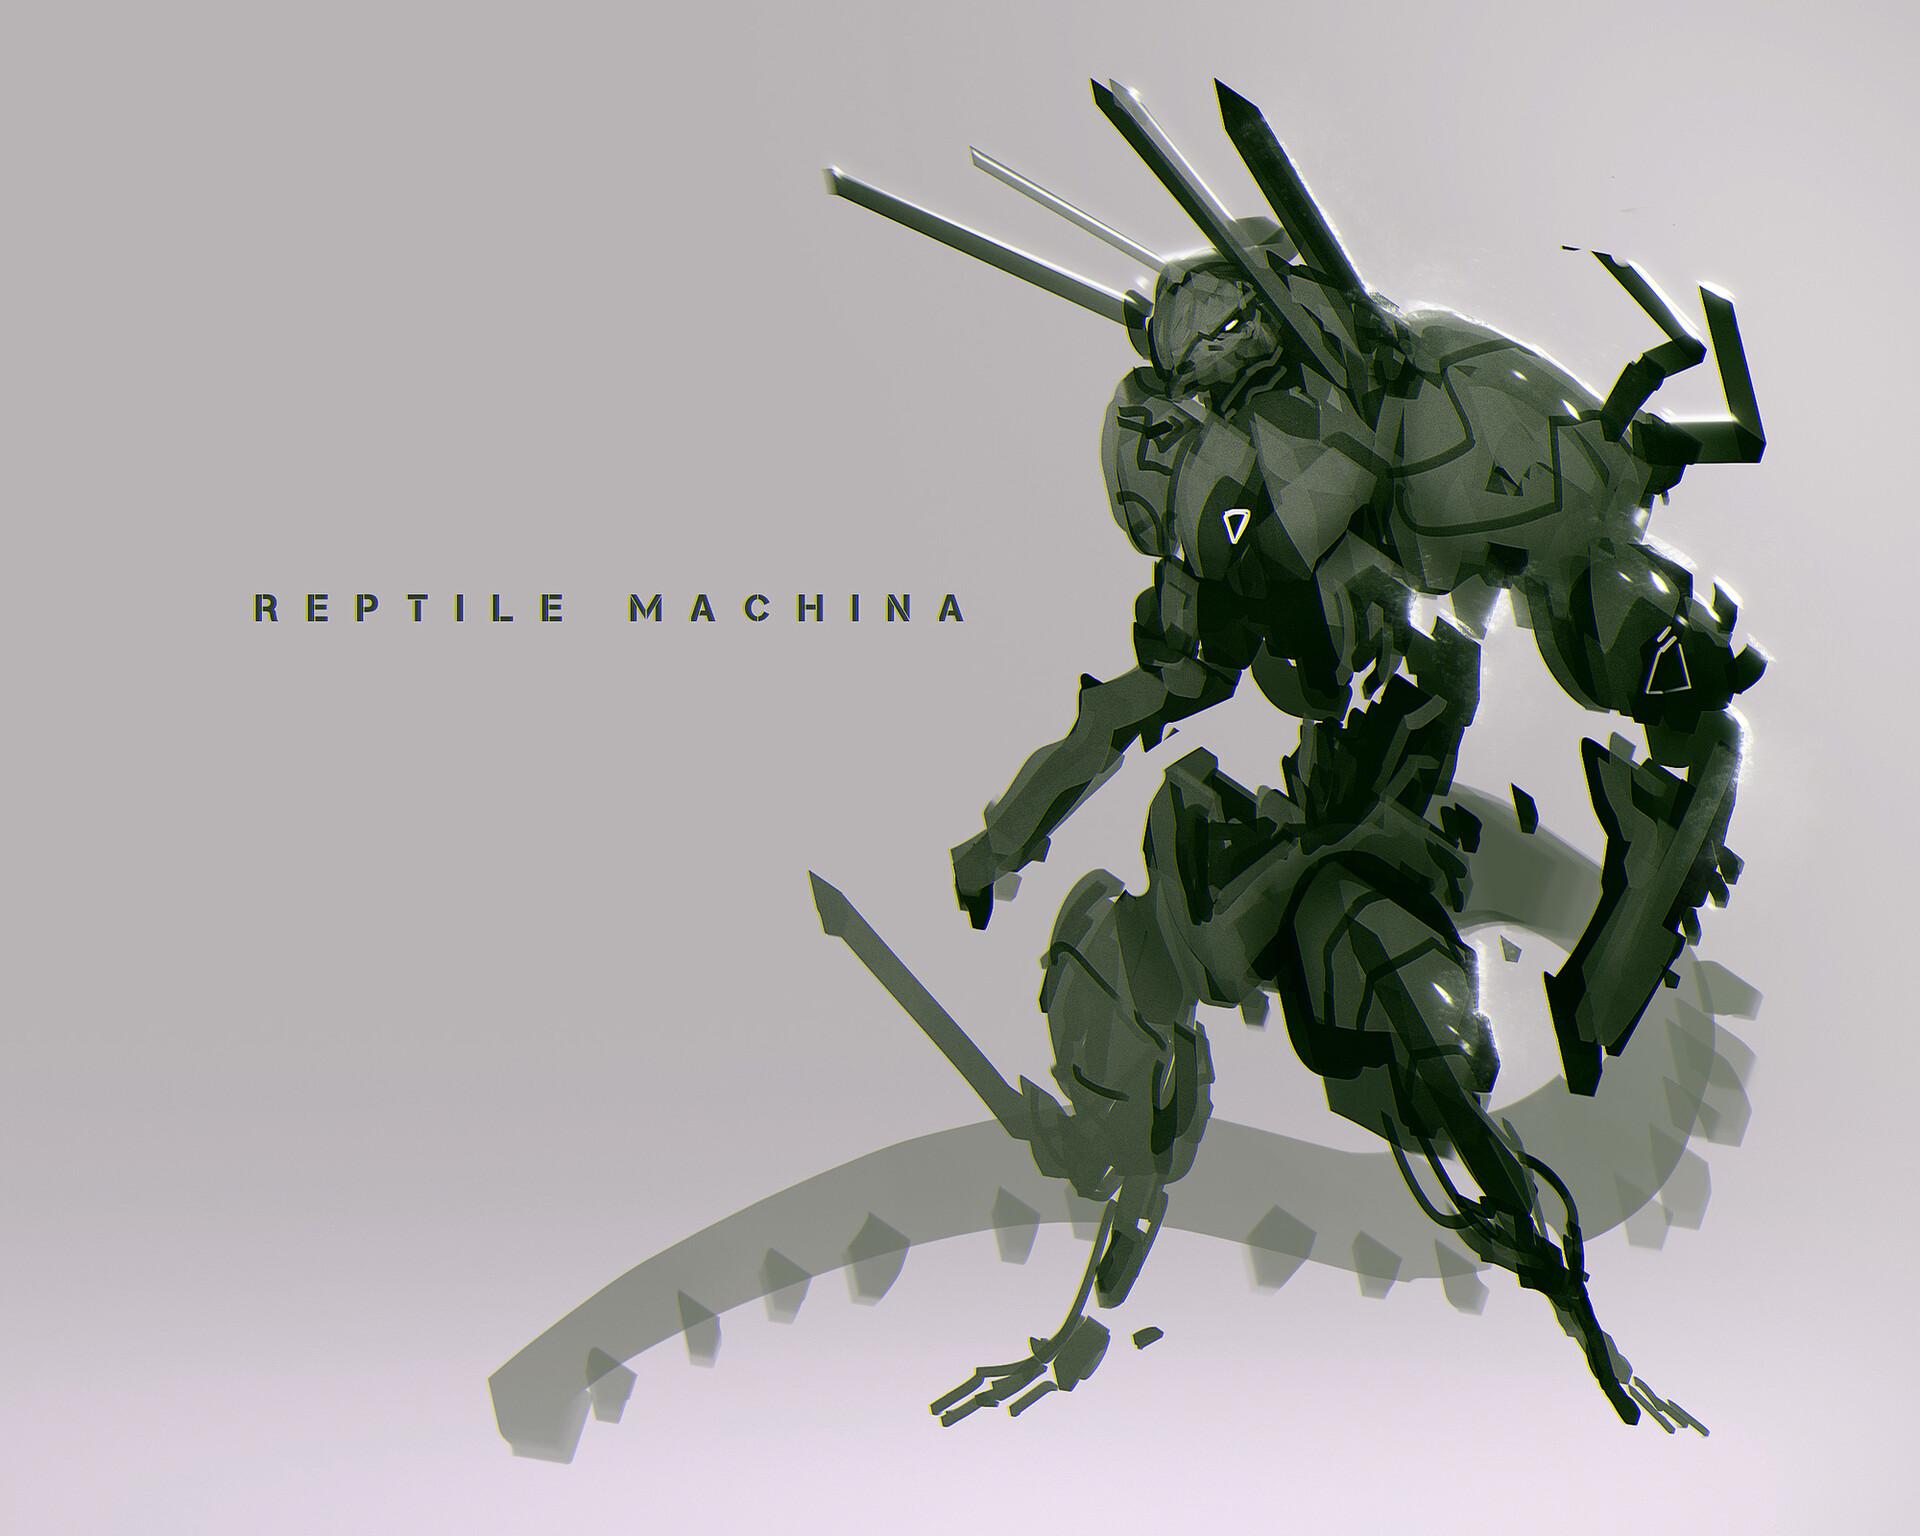 REPTILE MACHINA